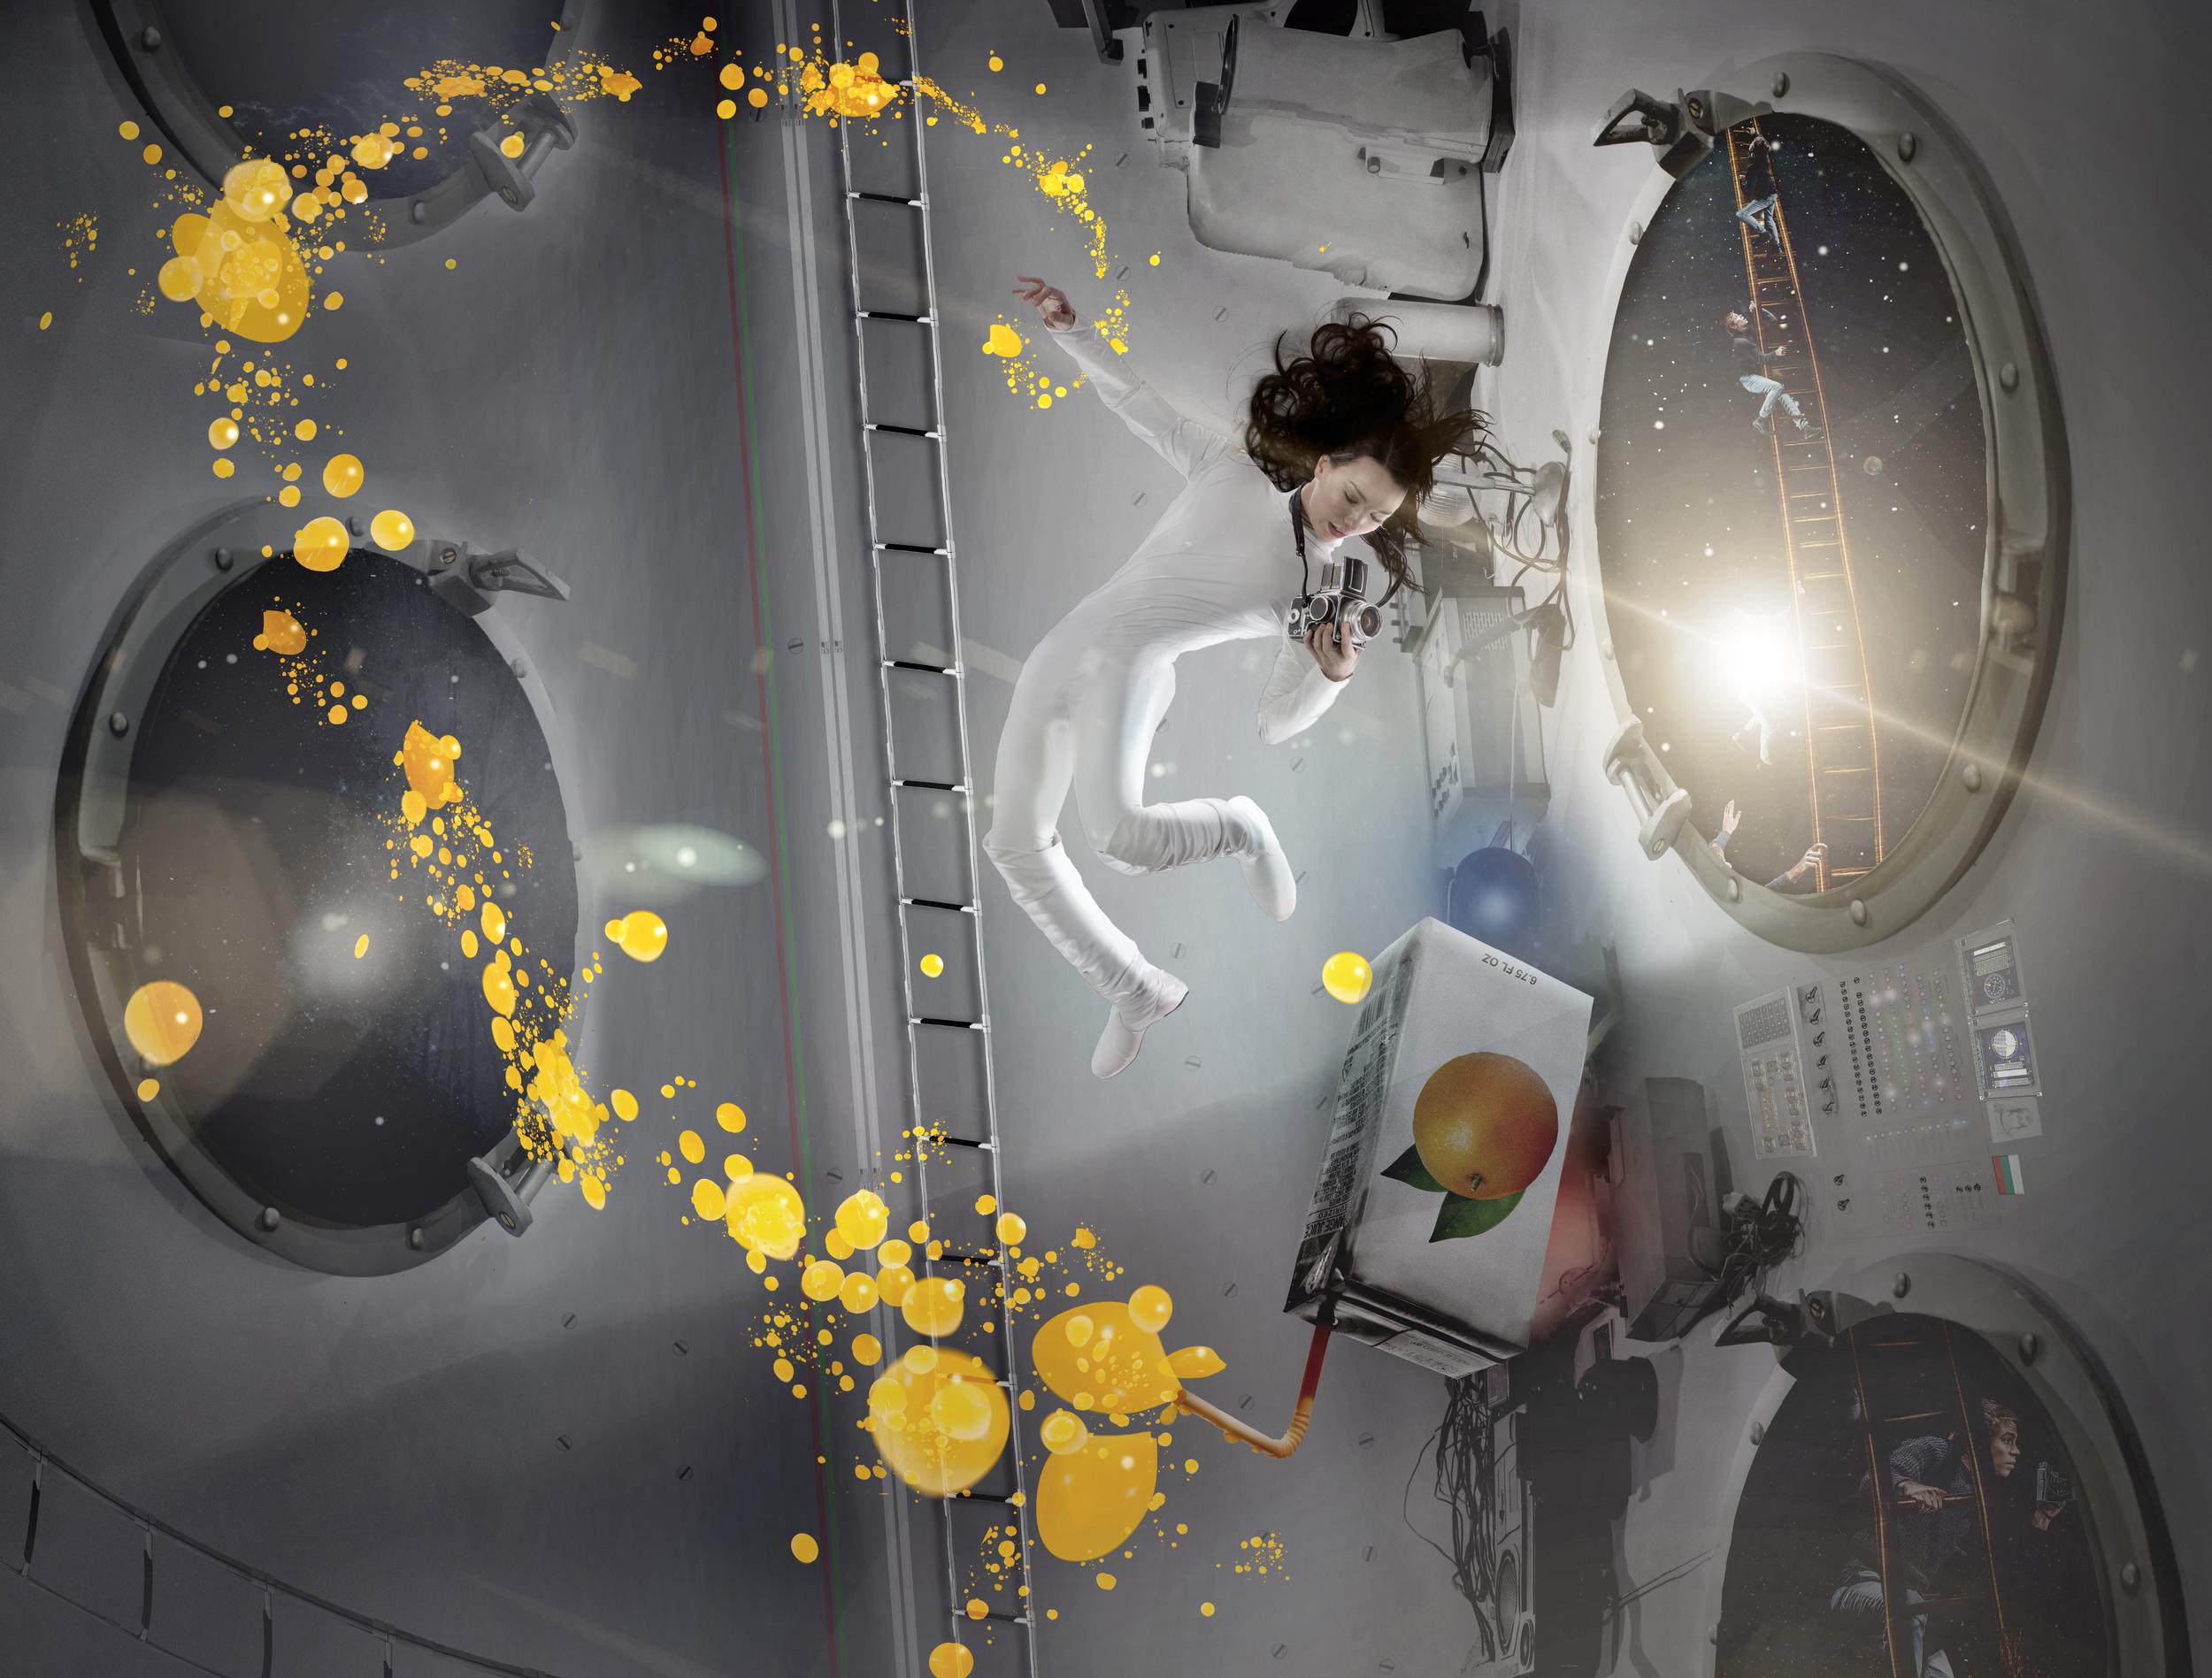 InsideSpaceship_13.jpg